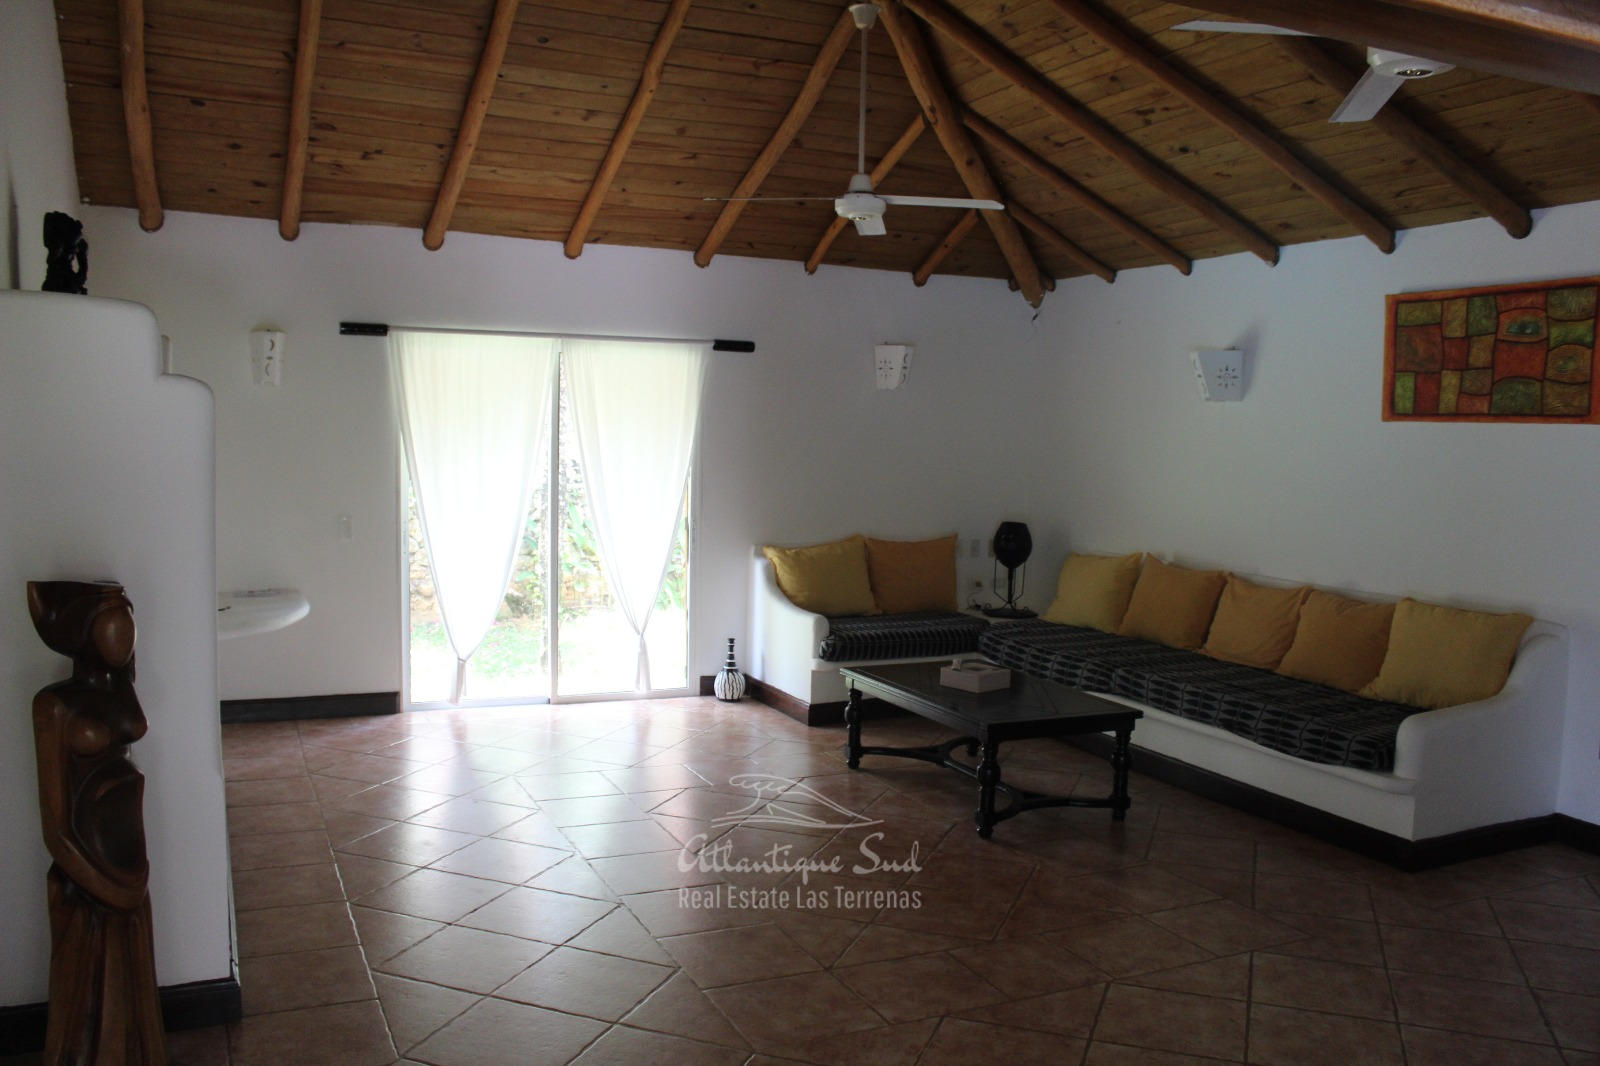 Villa Authentic Carribean Real Estate Las Terrenas Dominican Republic27.jpg